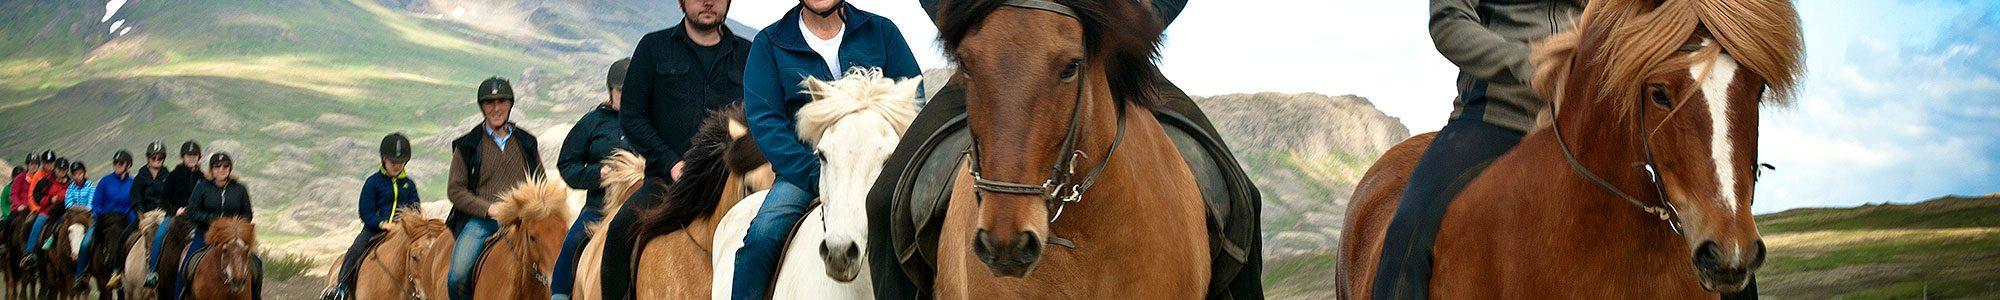 horse-rid